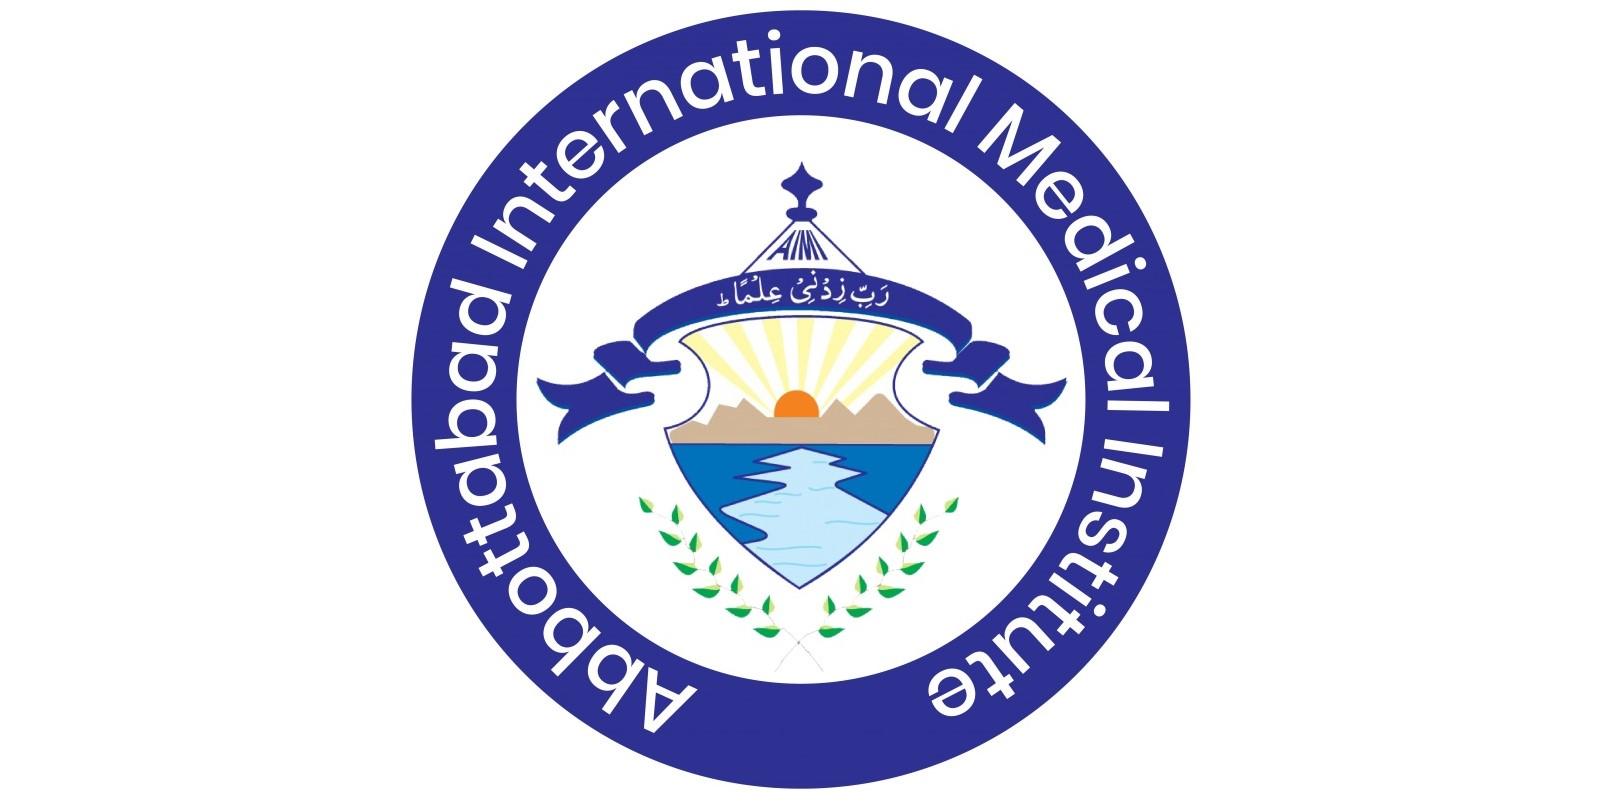 AIMI Application Portal